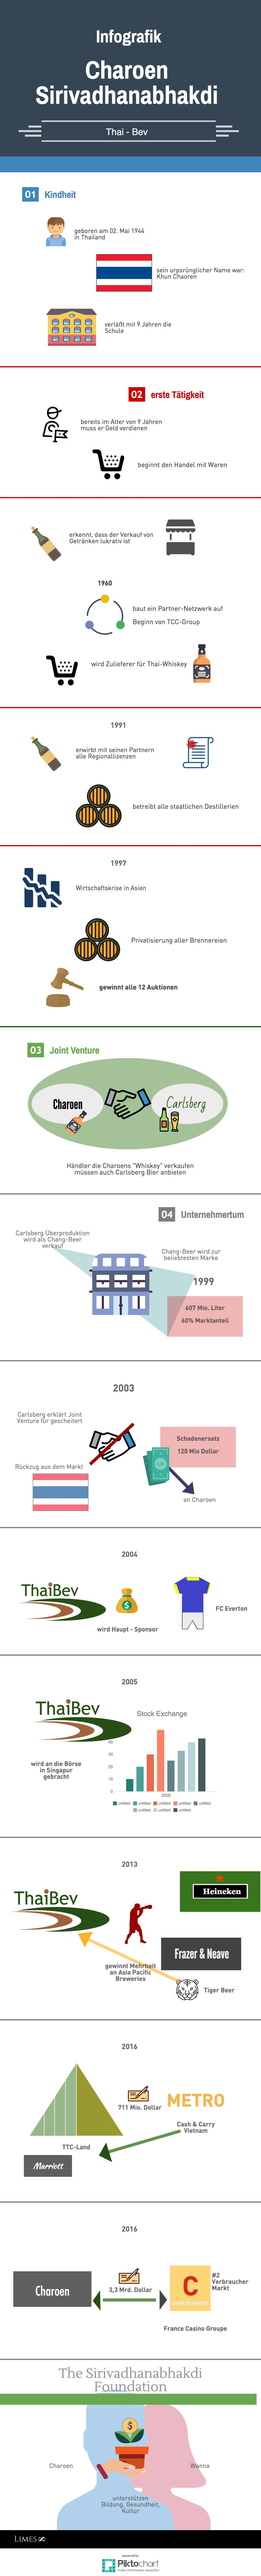 Infografik über den Getränke Milliardär Charoen Sirivadhanabhakdi